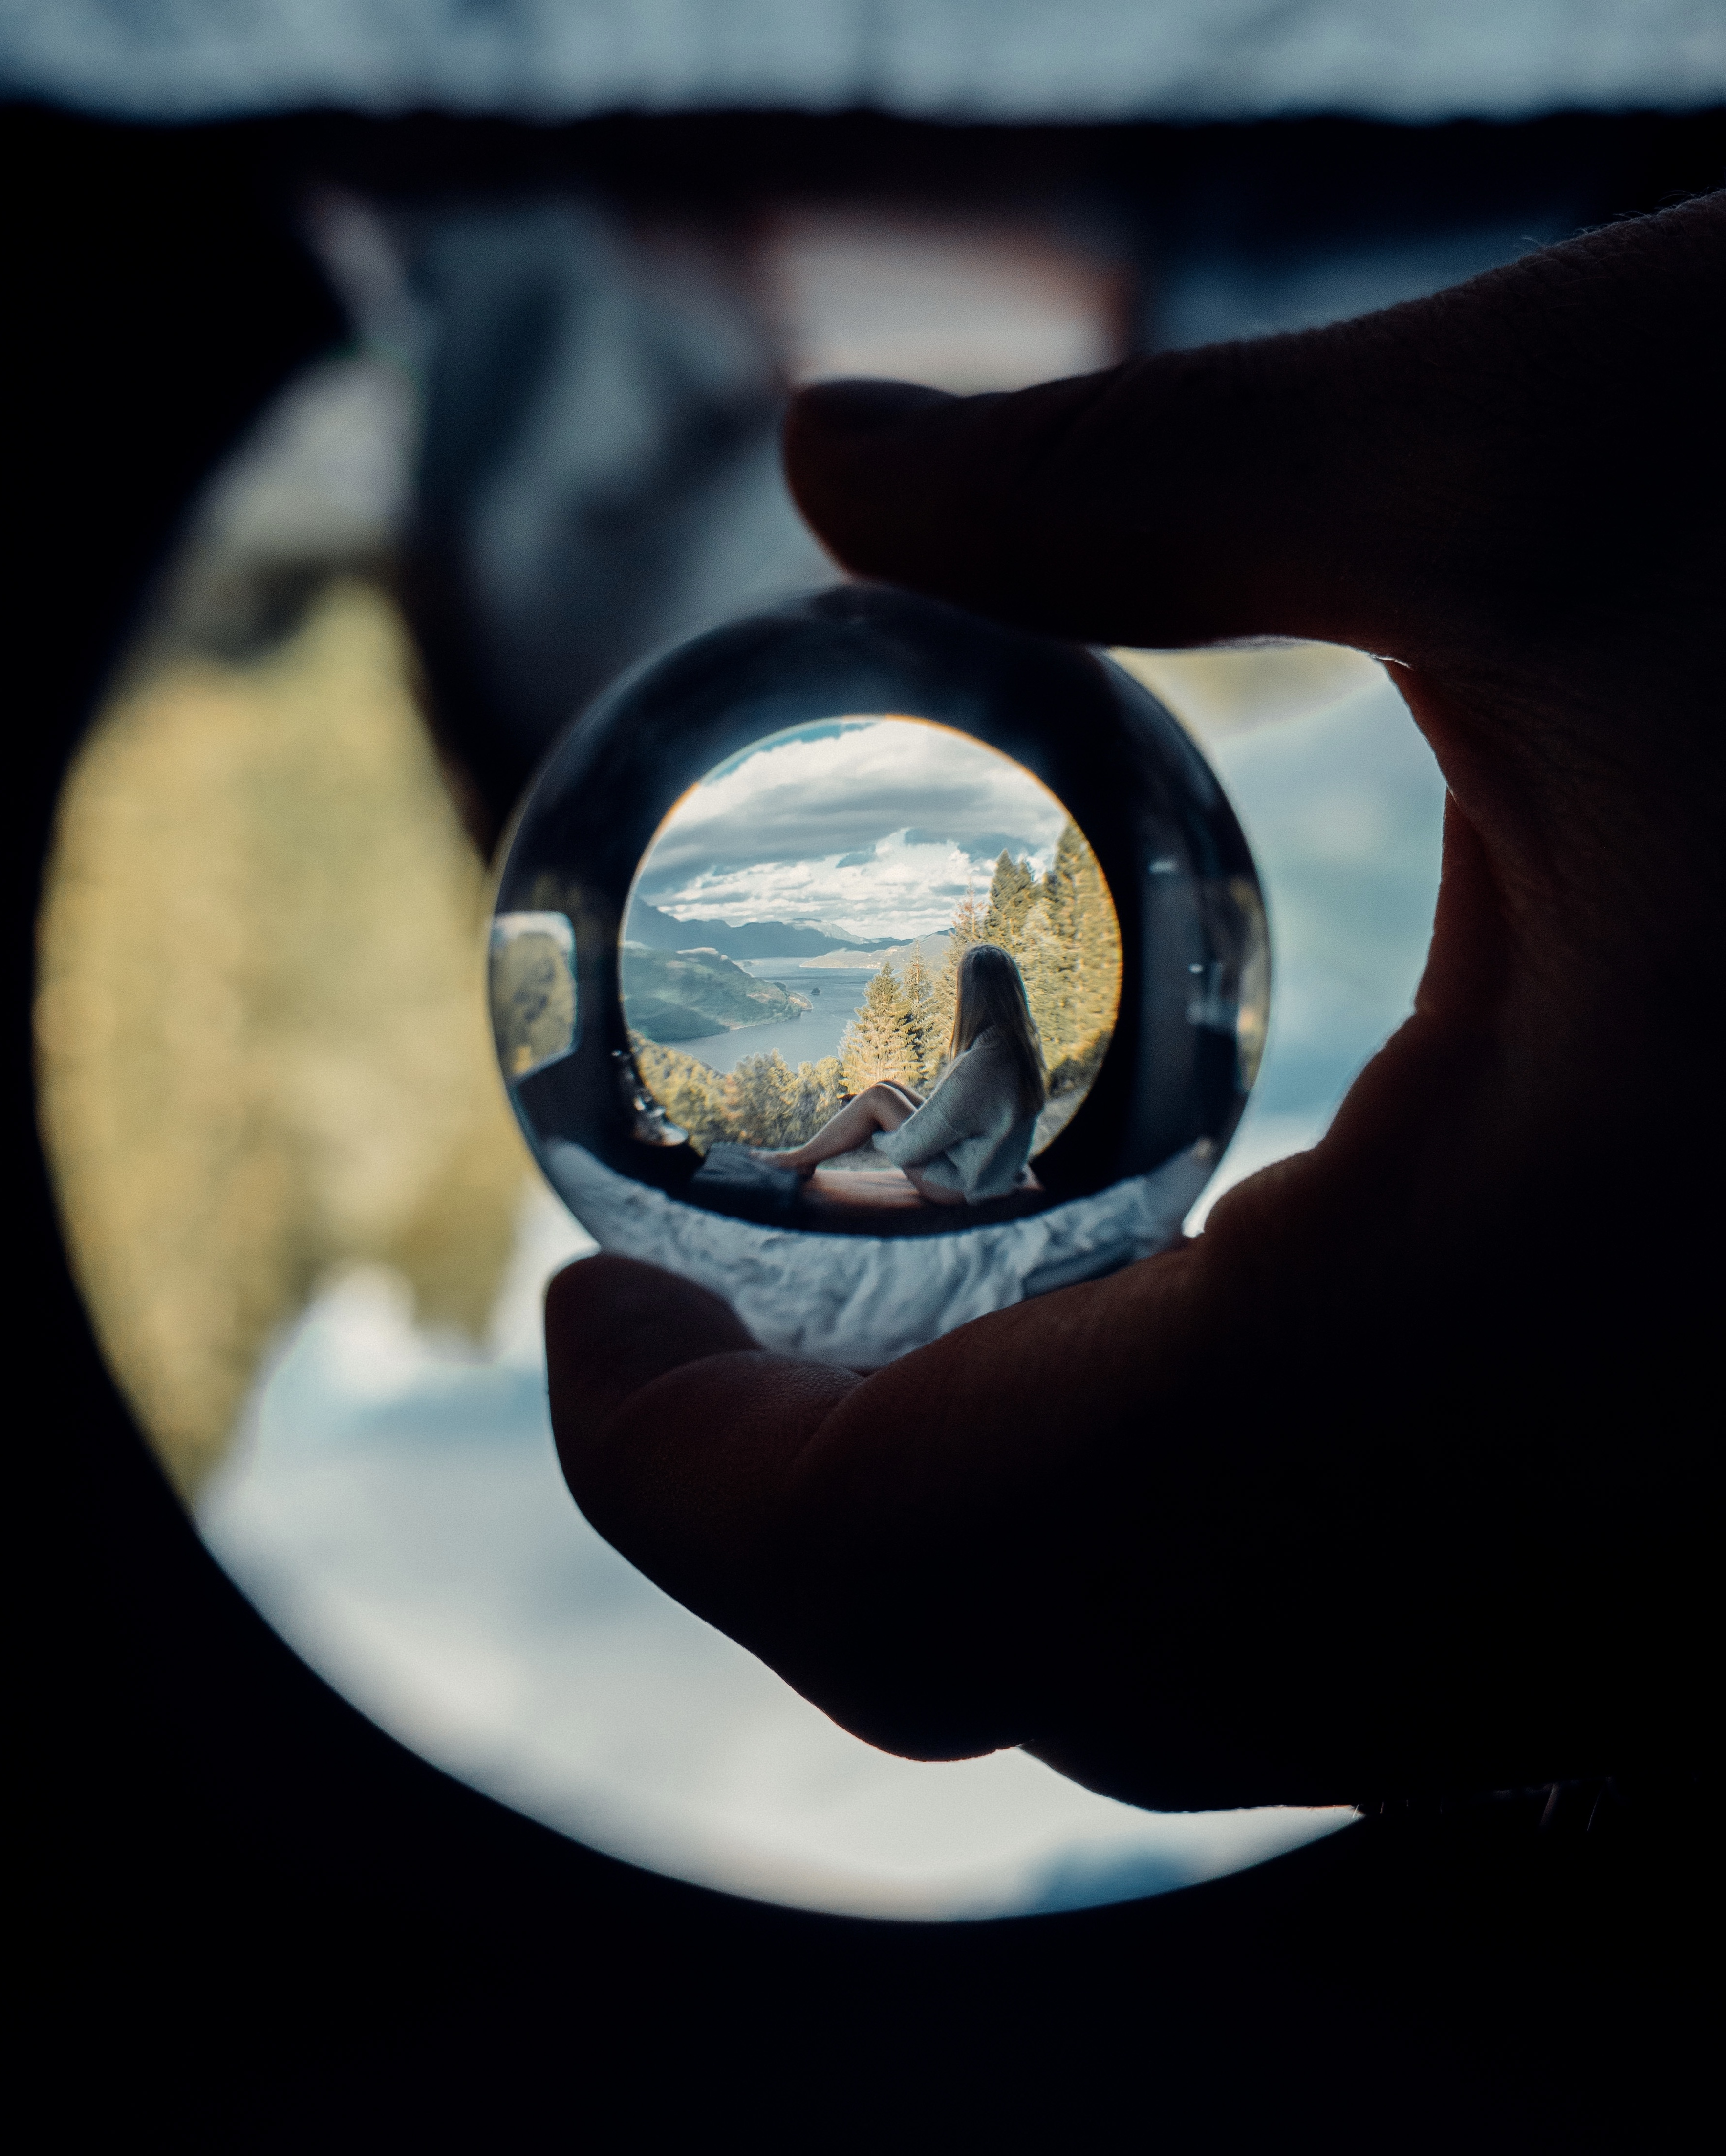 Birdbox, Fauske - Looking through a glass sphere